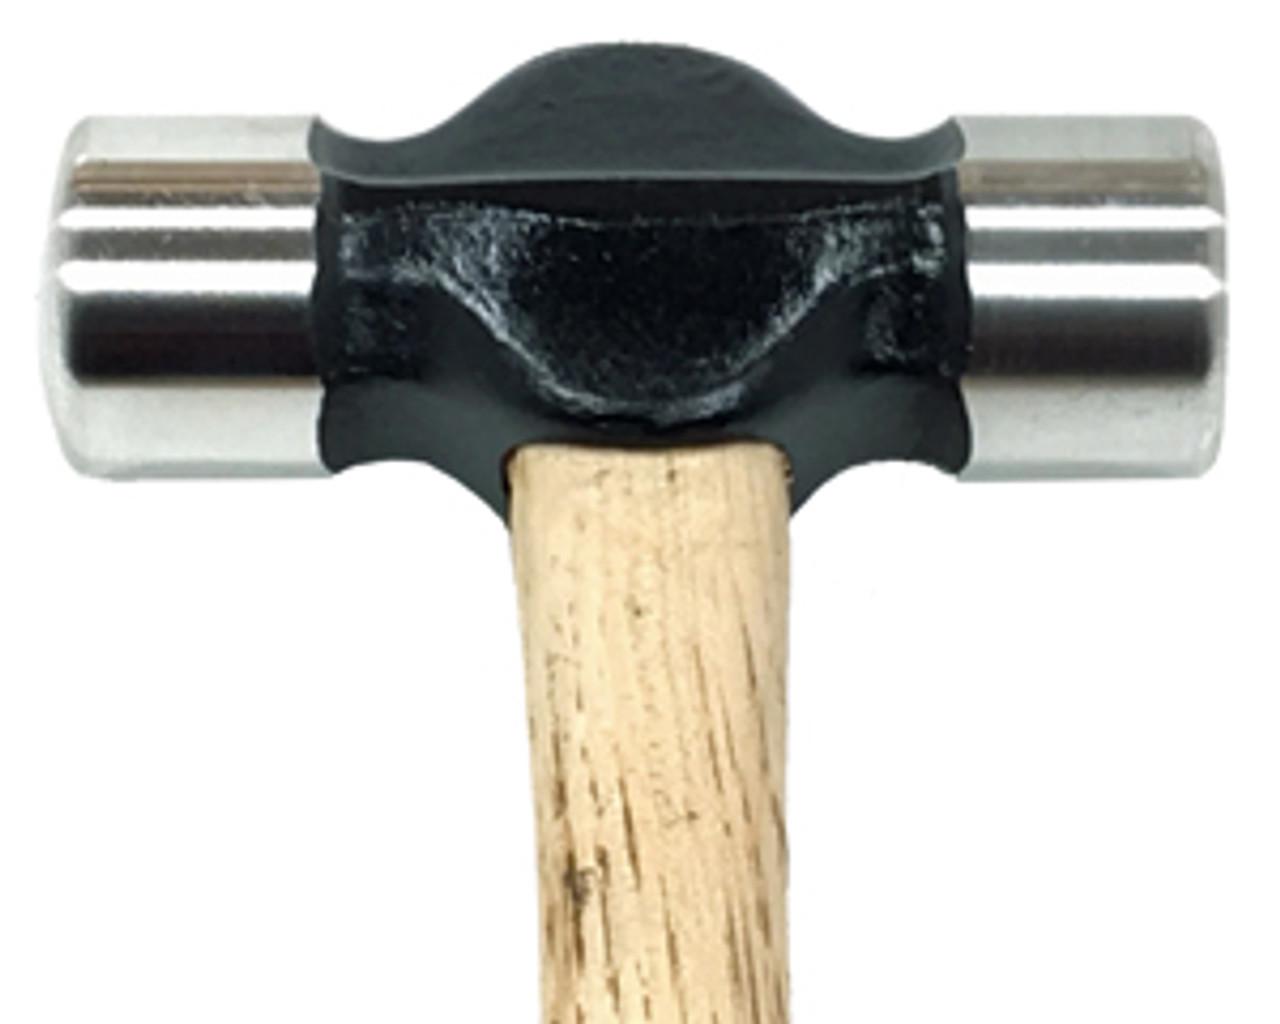 Nordic Forge 1 1/2 lb Farrier Rounding Hammer